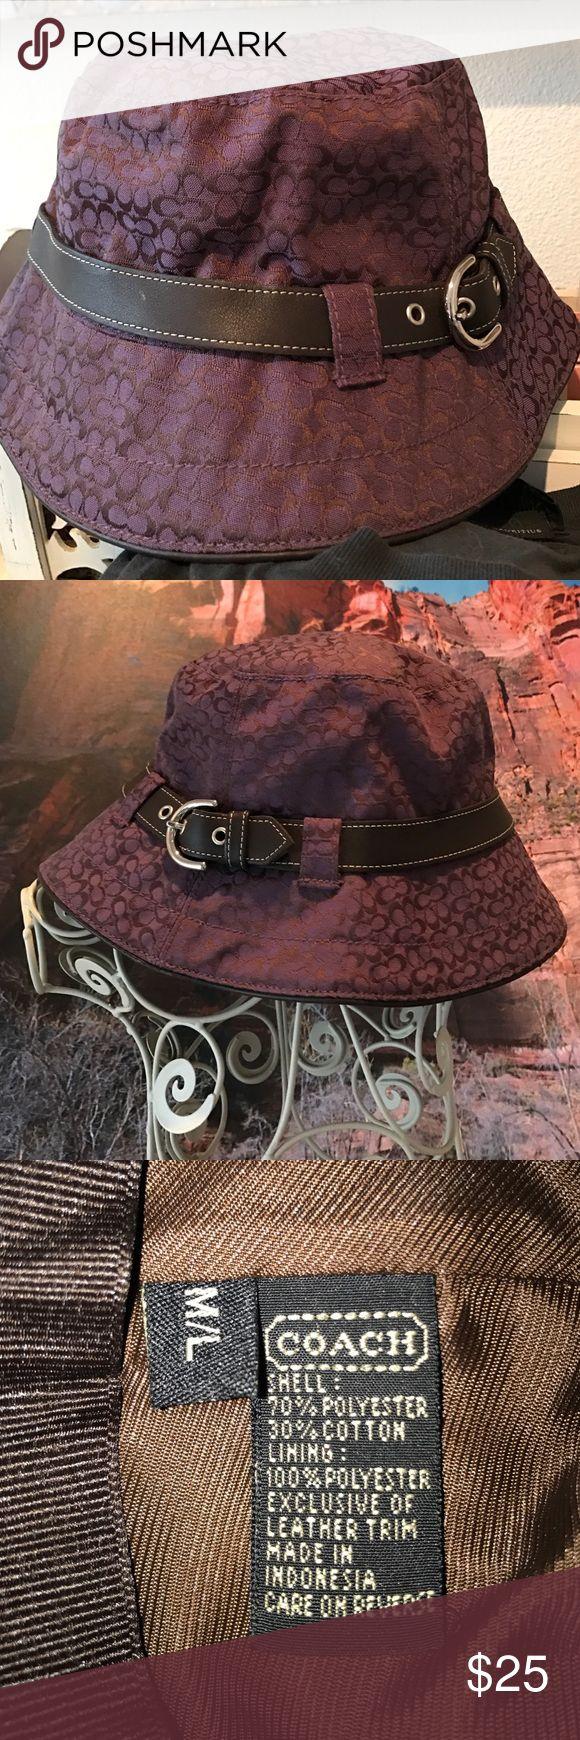 Authentic Coach hat Super cute plum colored bucket hat. Coach Accessories Hats